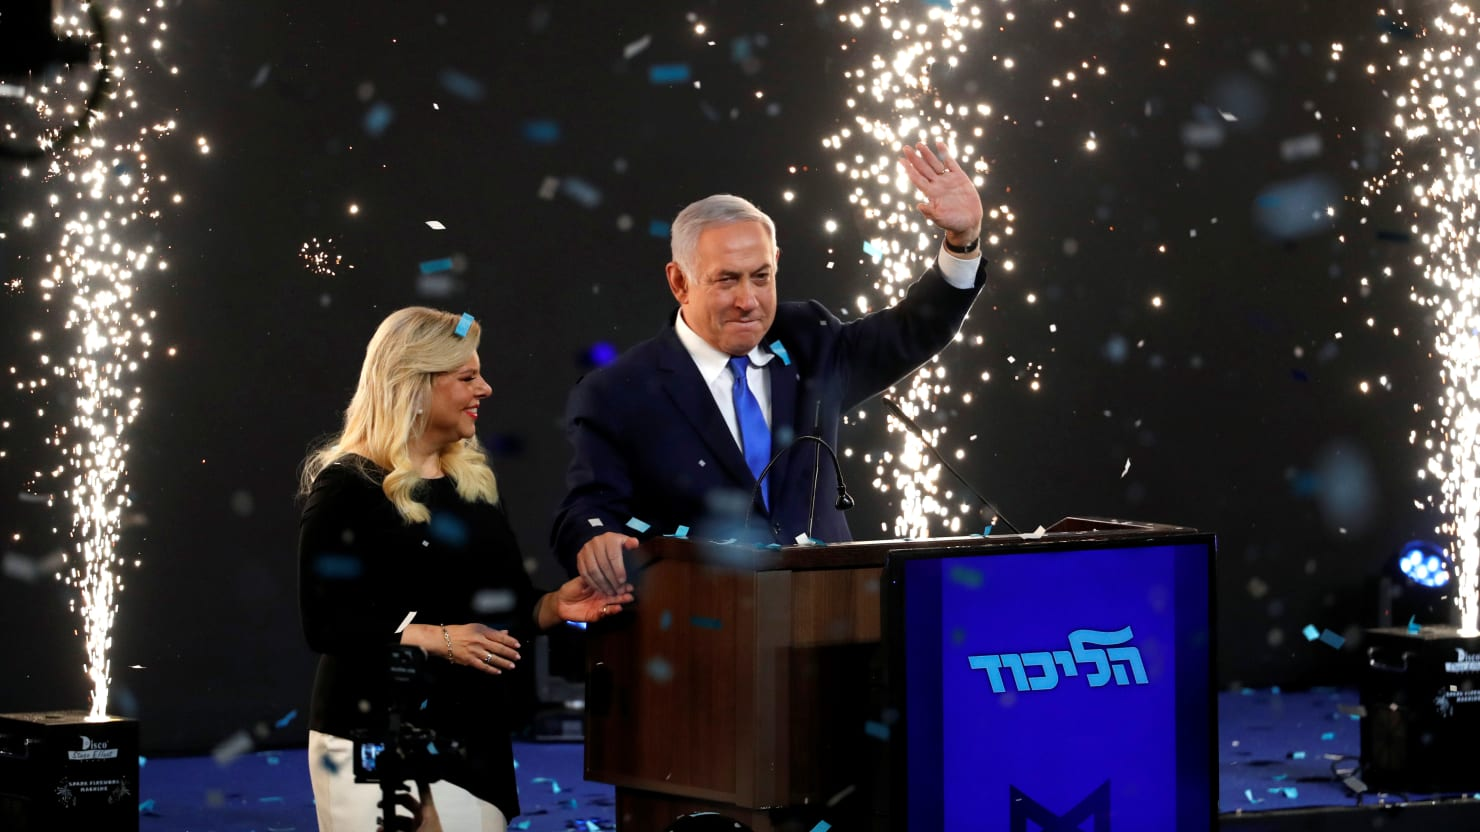 Netanyahu Set for Record 5th Term as Israeli Prime Minister